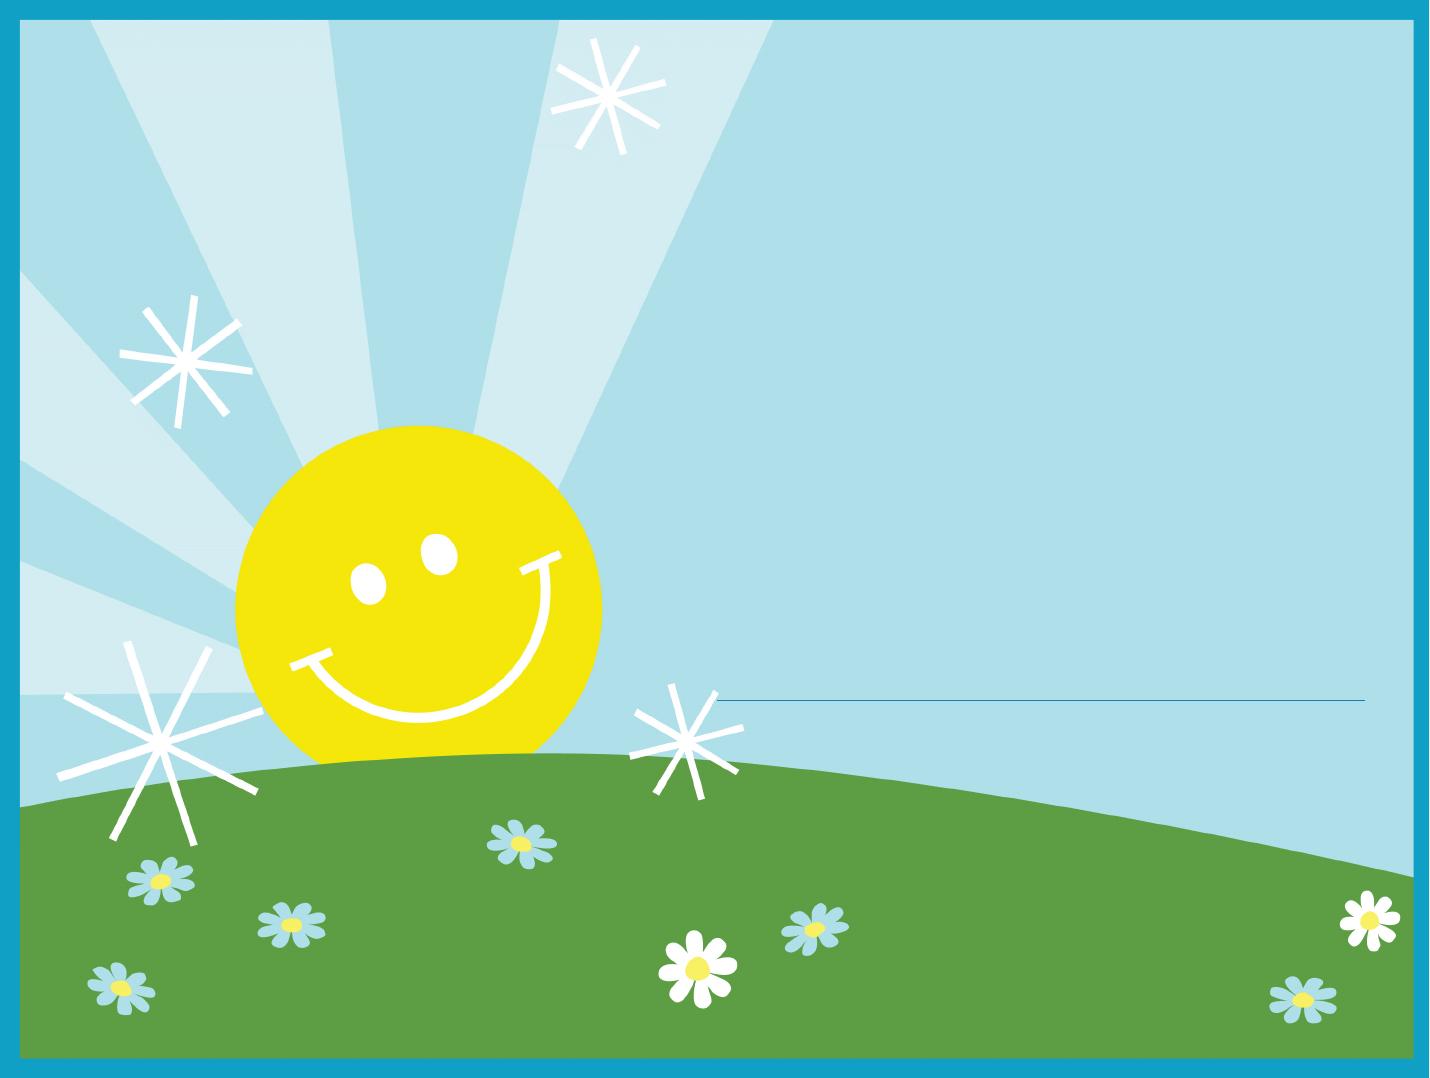 Free Preschool Diploma Certificate (Sunshine Design) - docx With Regard To Preschool Graduation Certificate Template Free